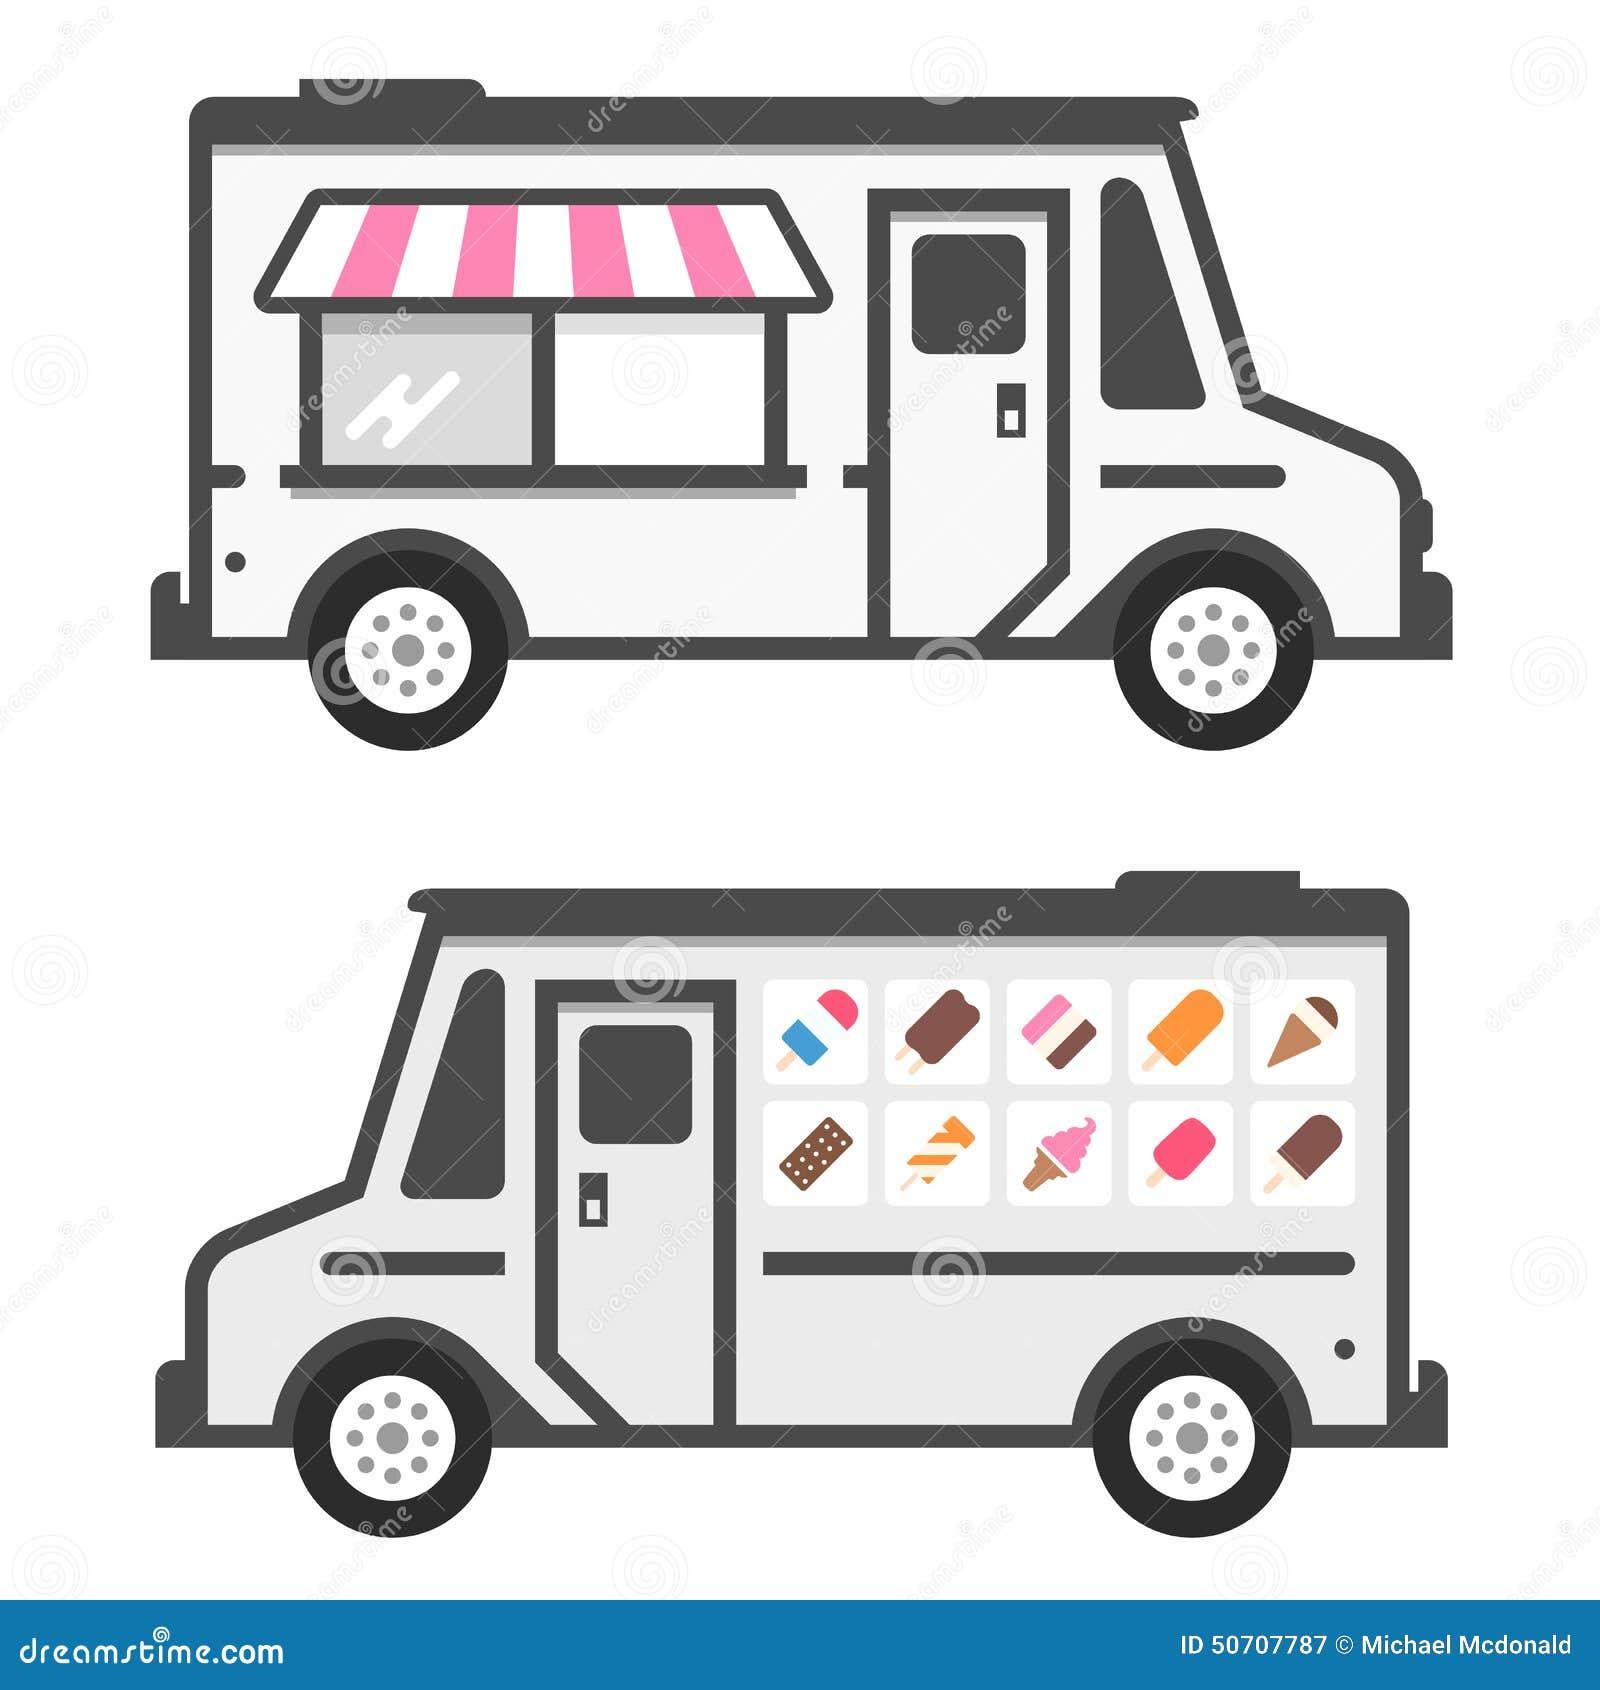 10 Secrets of Ice Cream Truck Drivers